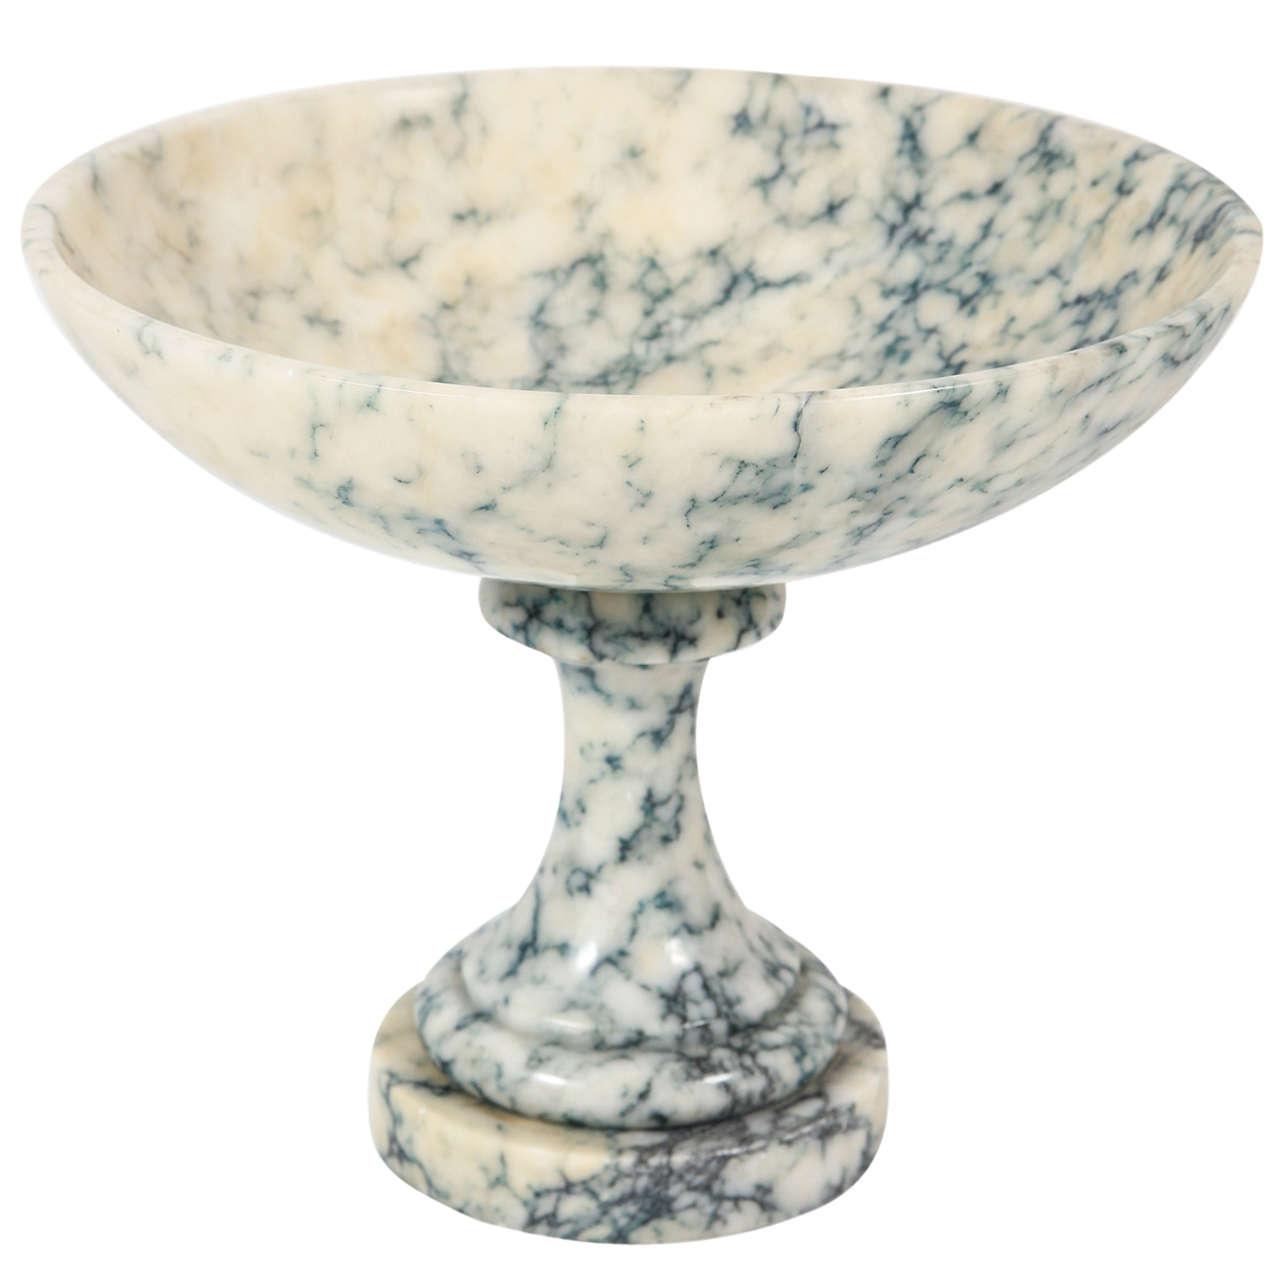 Marble Pedestal Bowl At 1stdibs